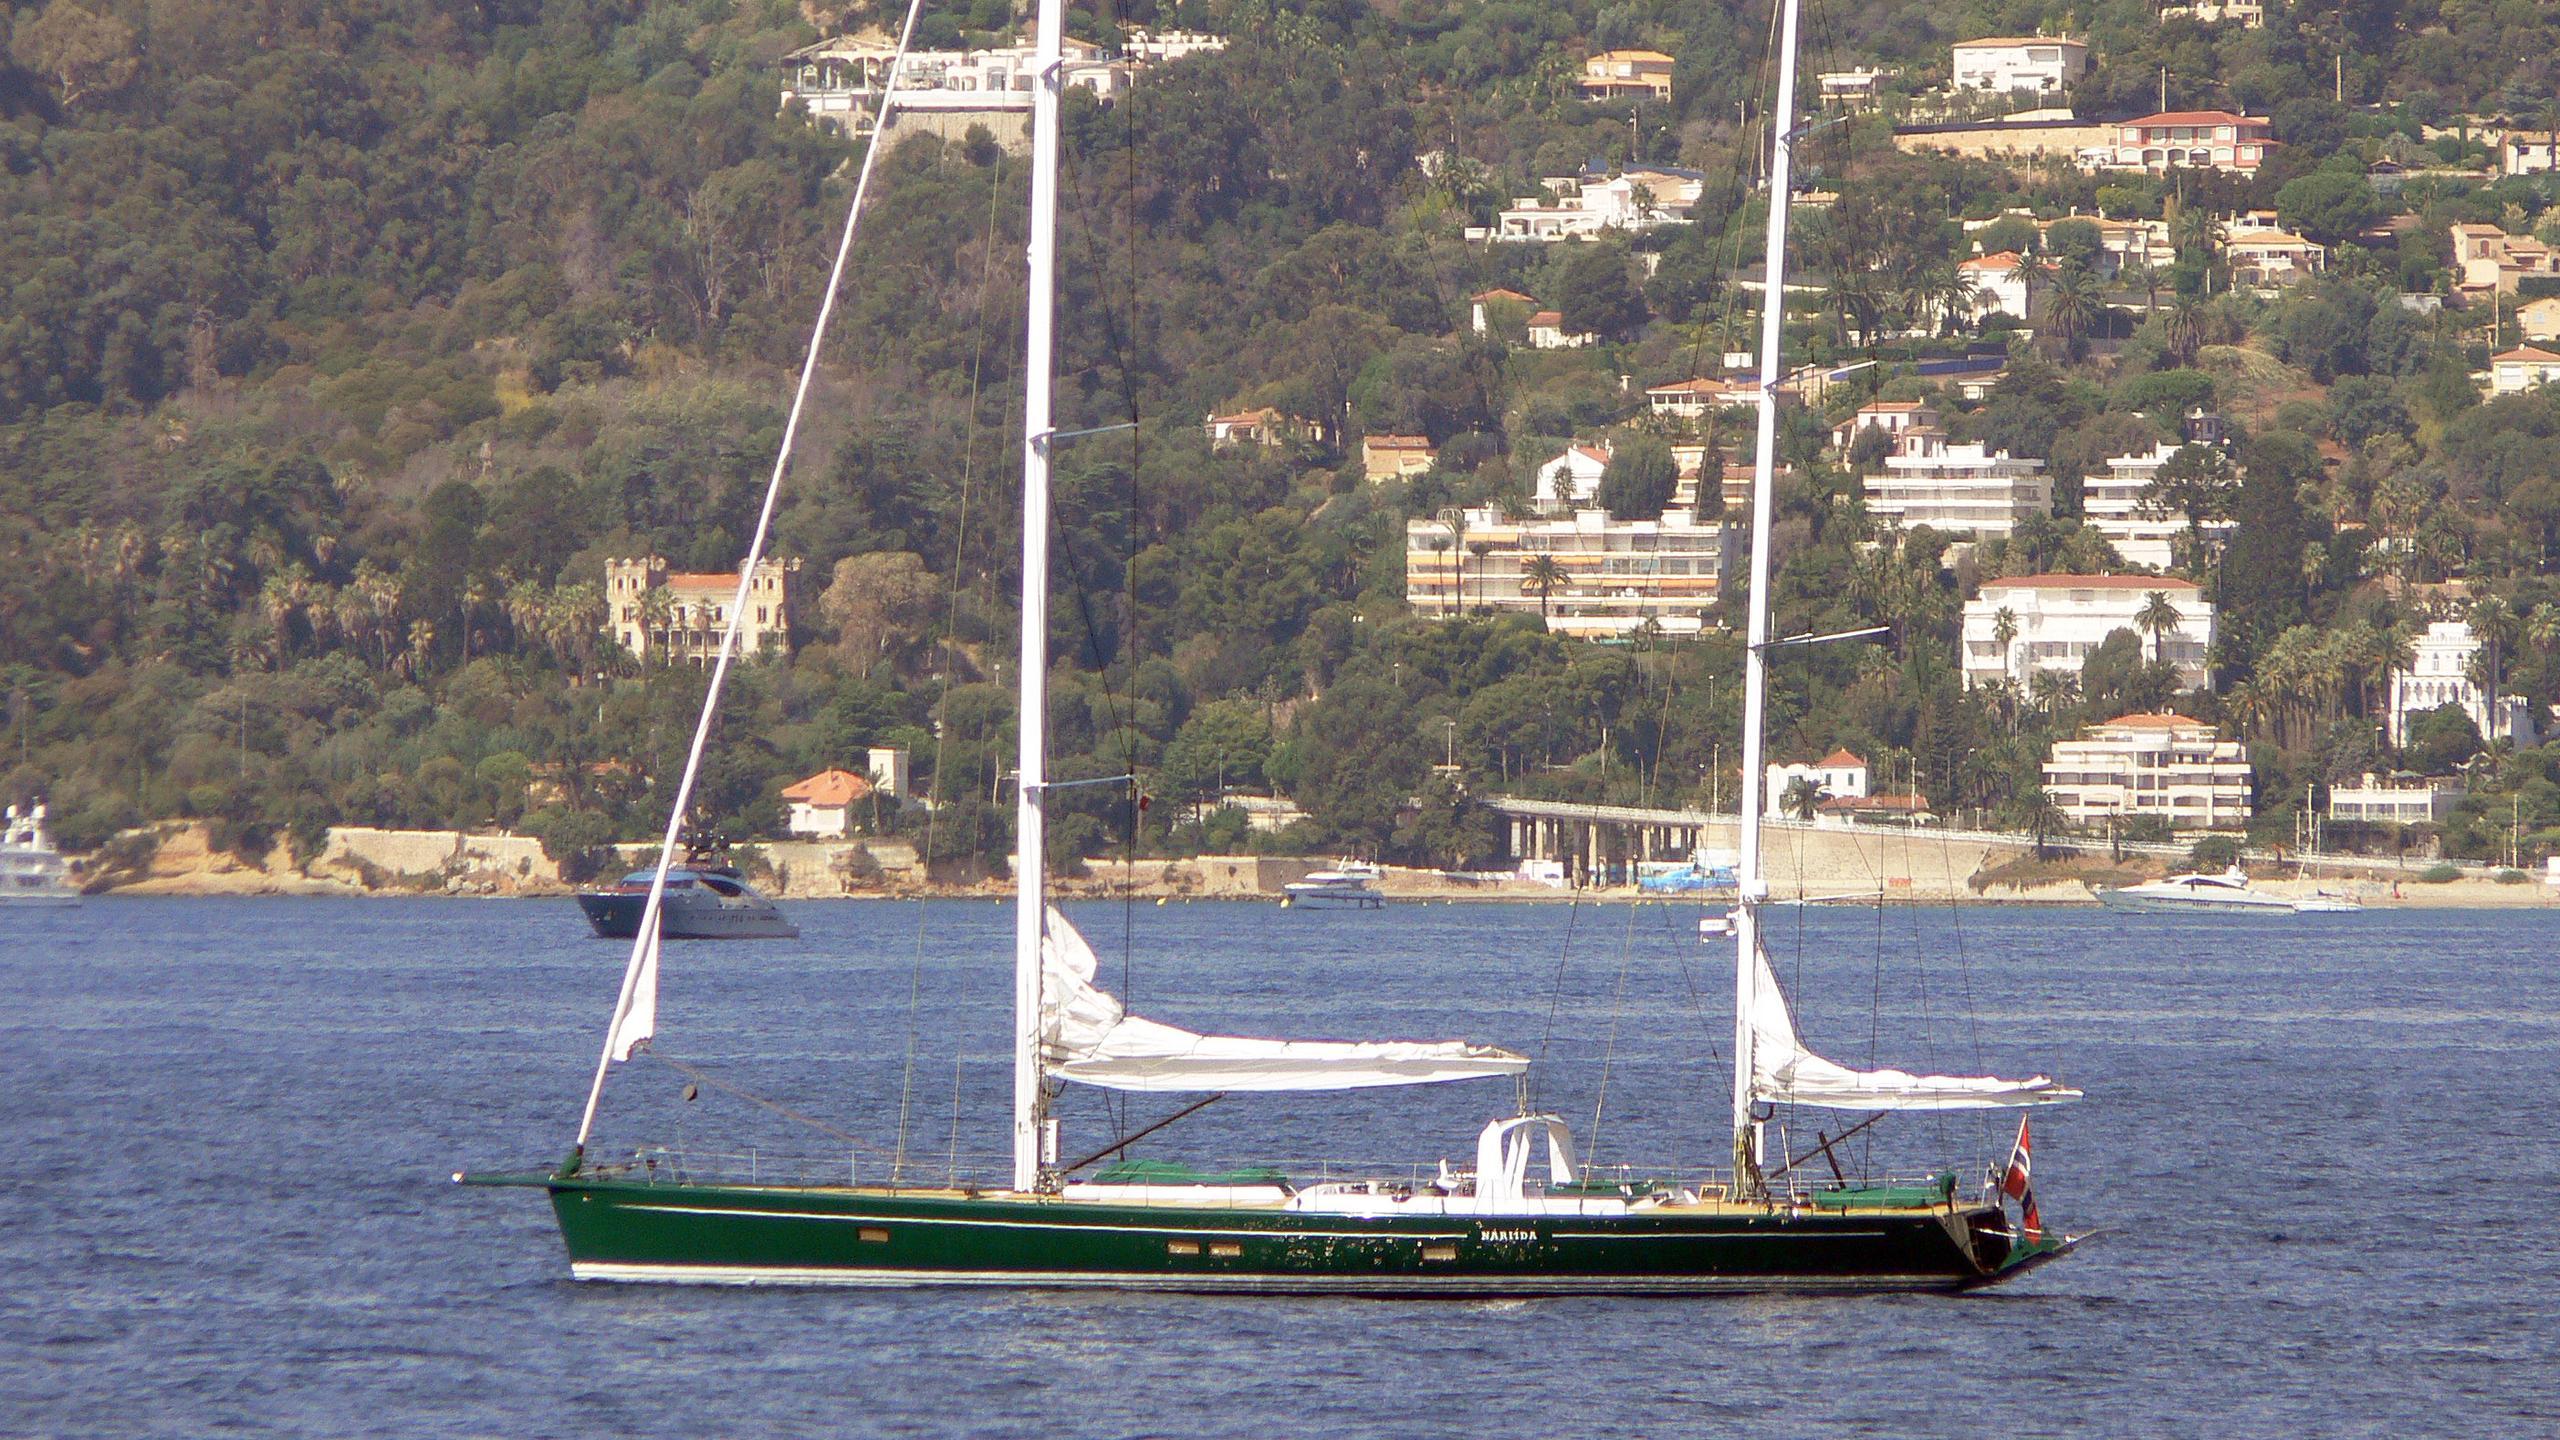 nariida-sailing-yacht-concordia-1994-32m-moored-profile